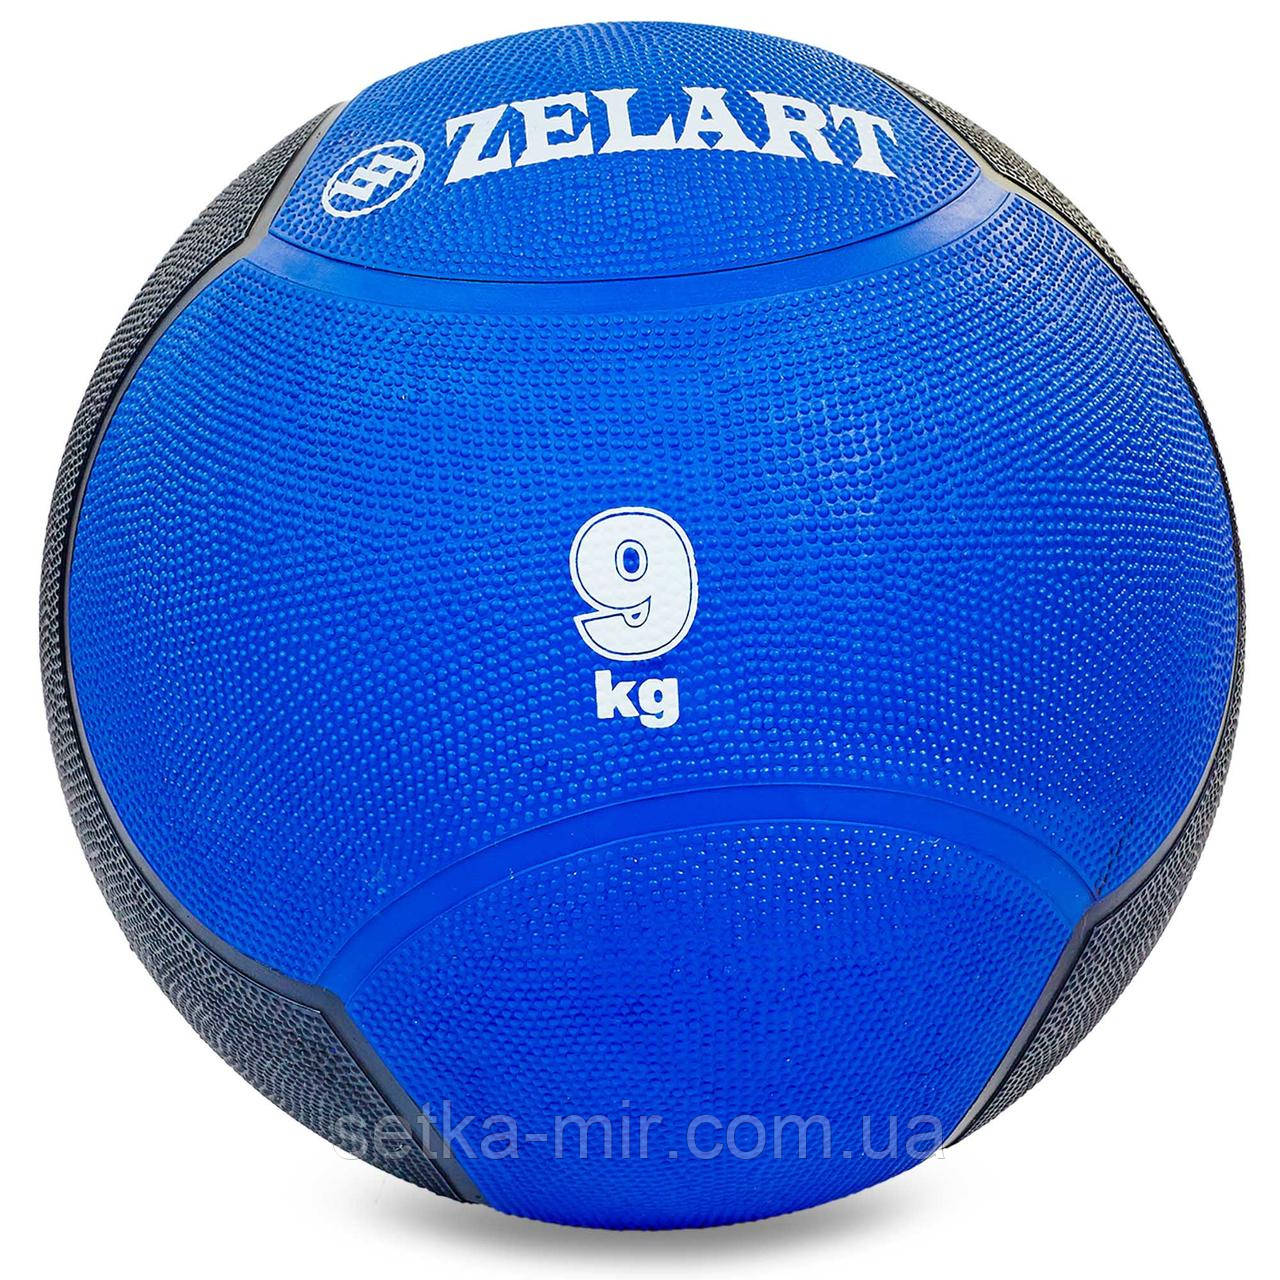 М'яч медичний медбол Zelart Medicine Ball FI-5121-9 9кг